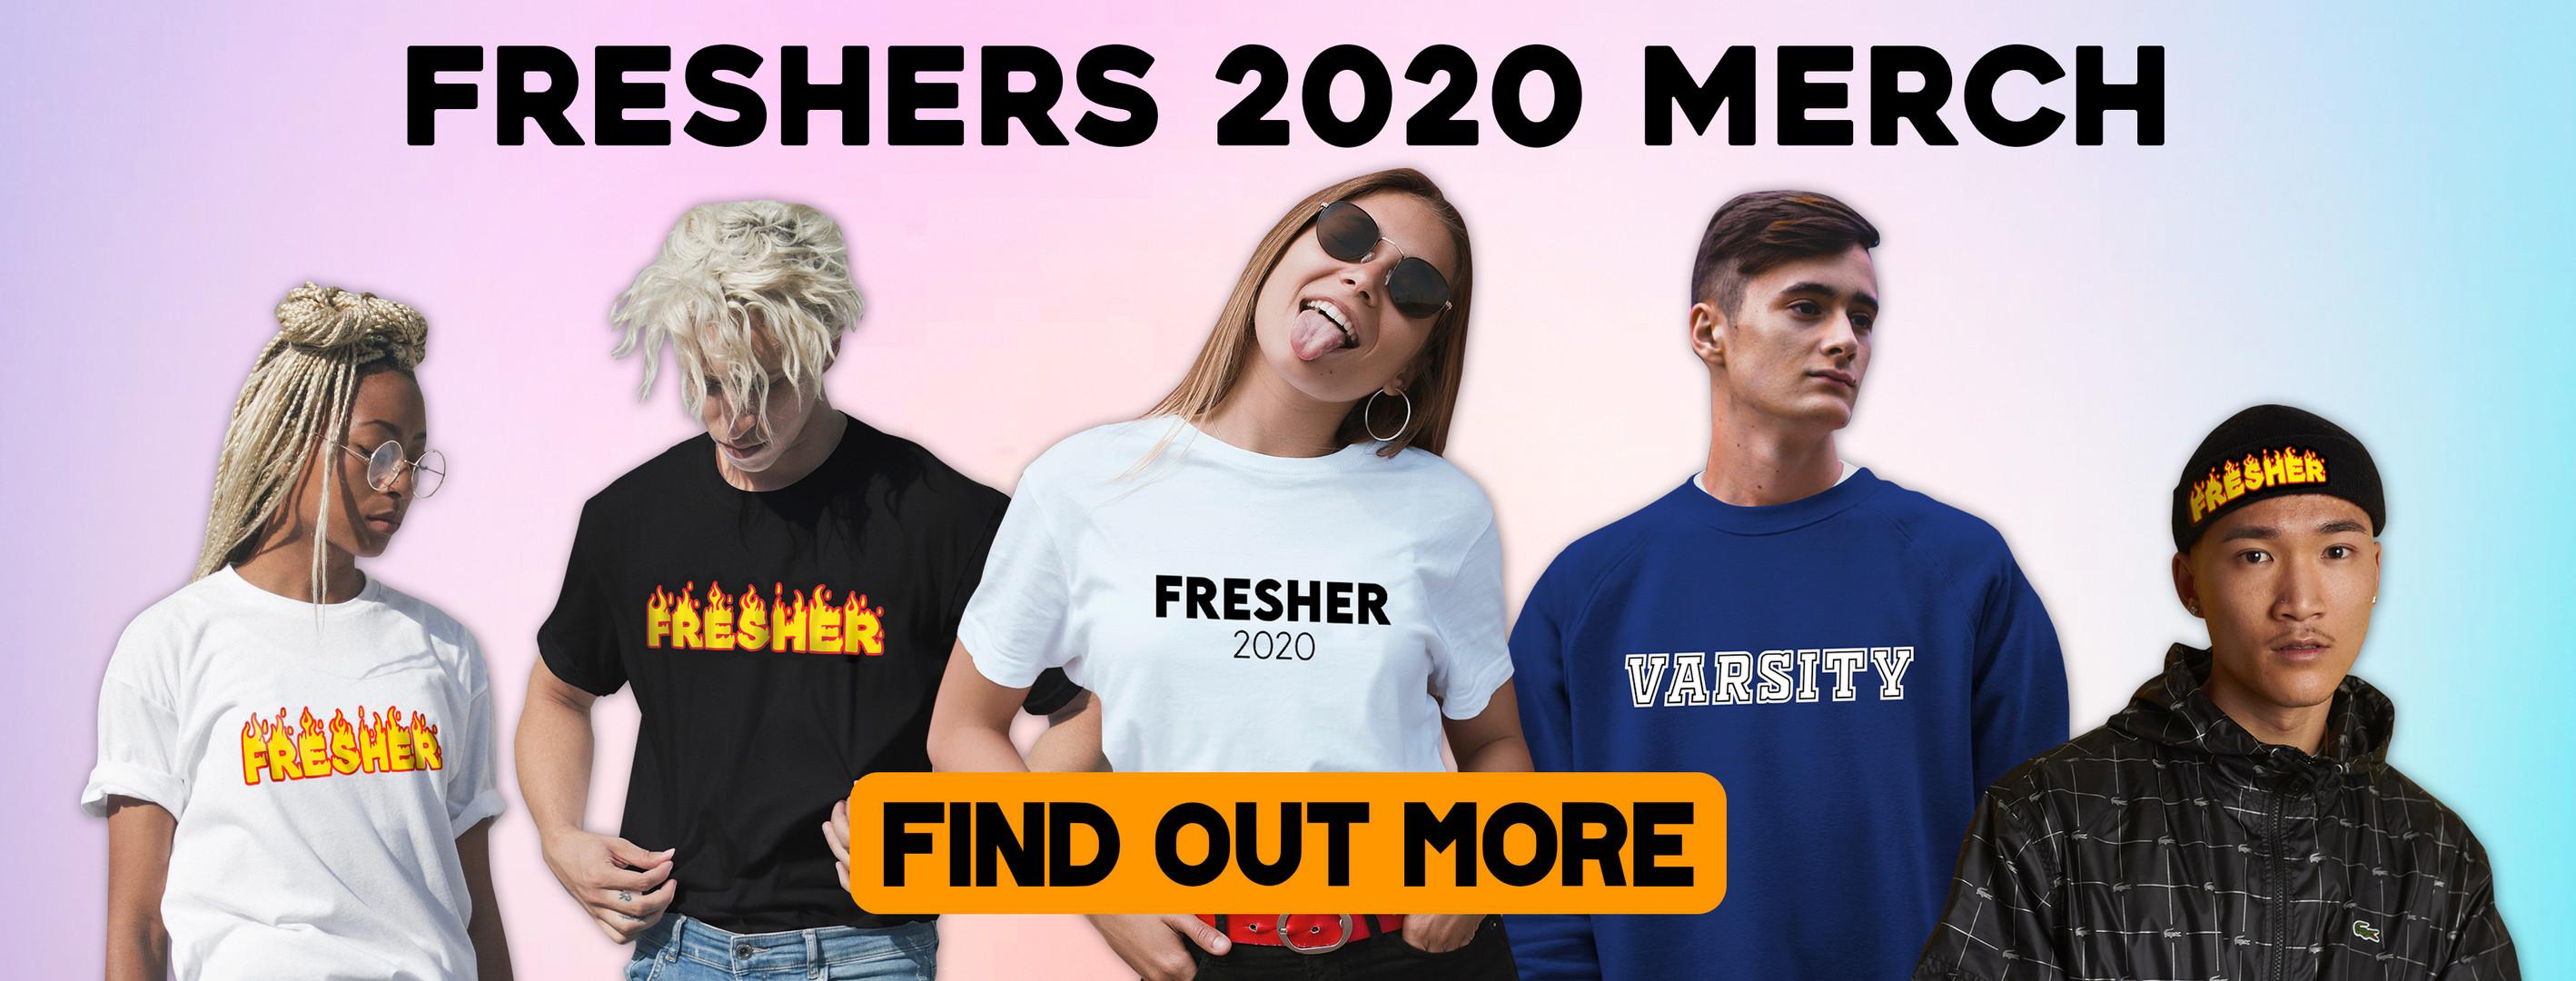 Freshers Merch Web Poster Design